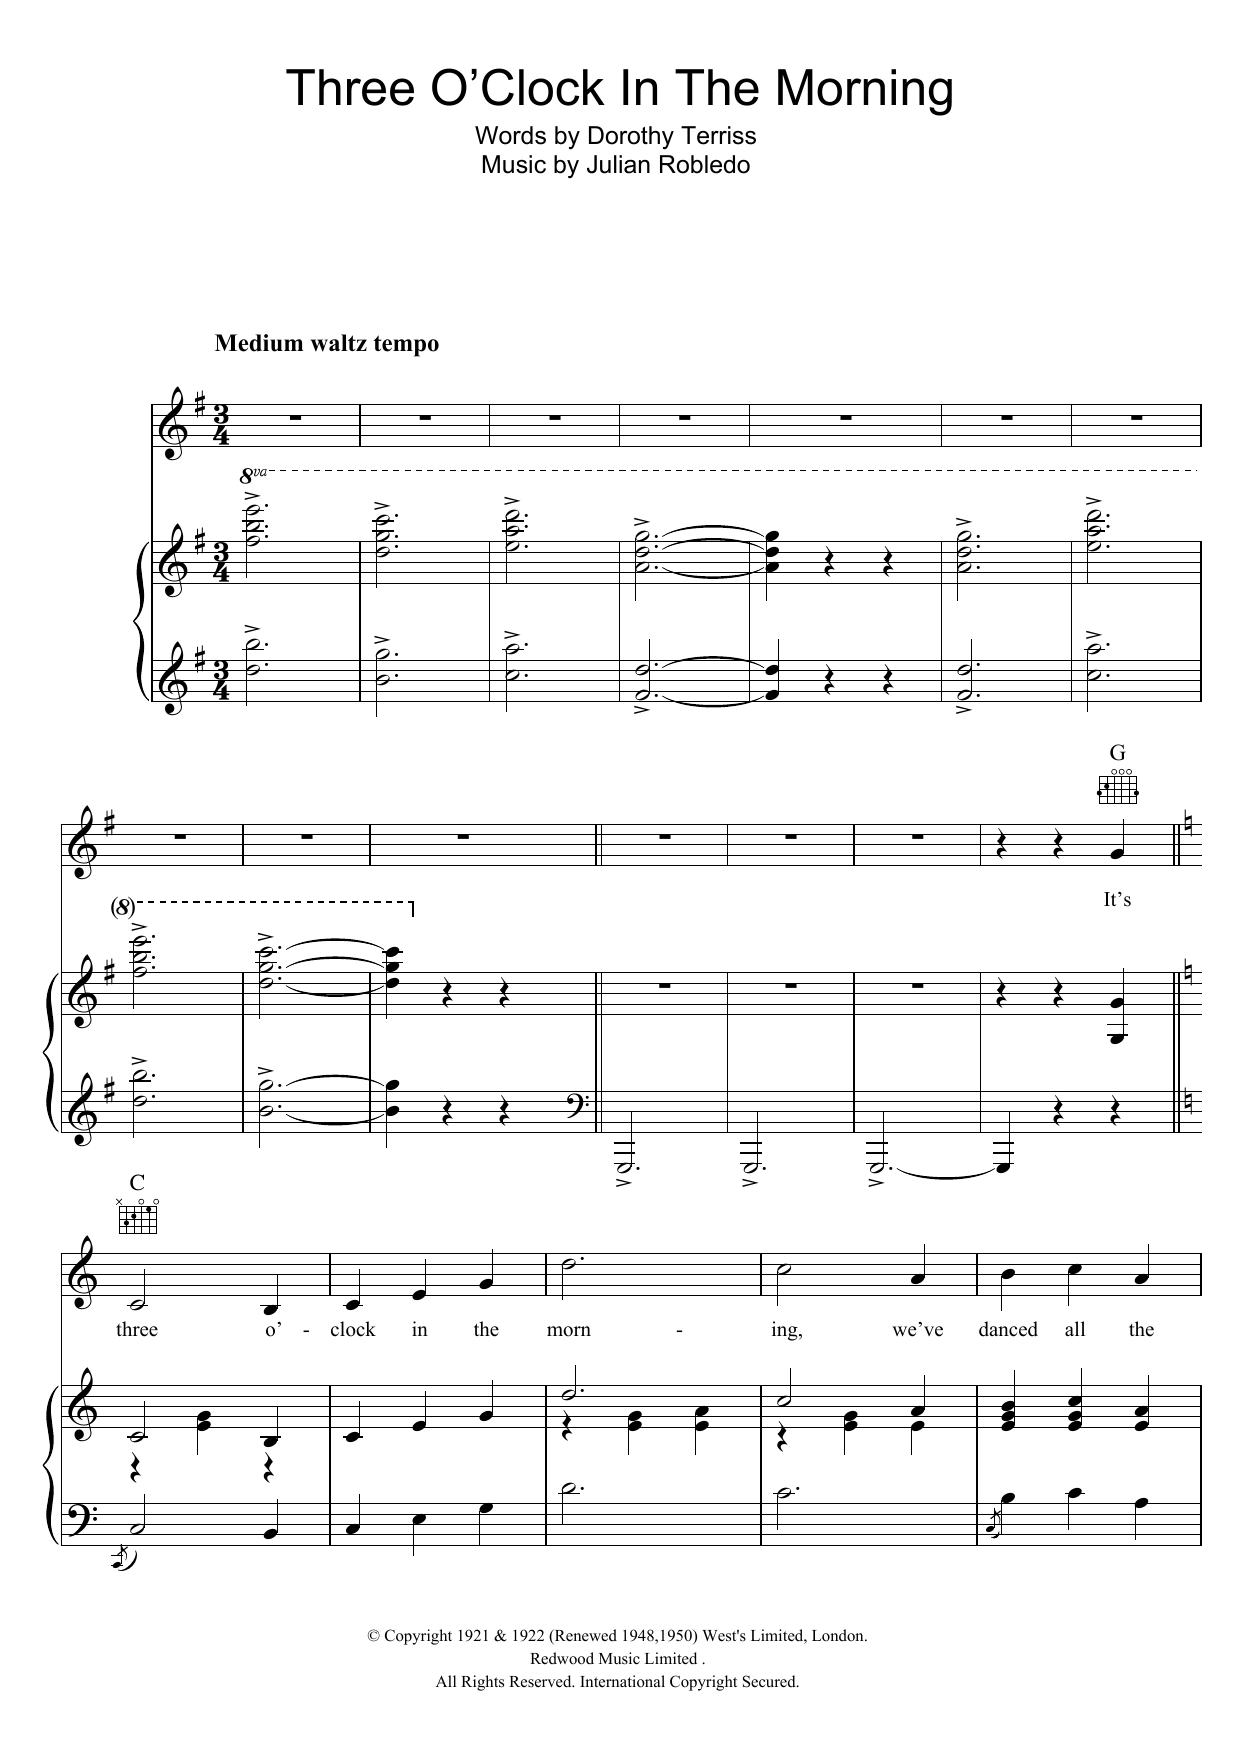 Three O'Clock In The Morning Sheet Music